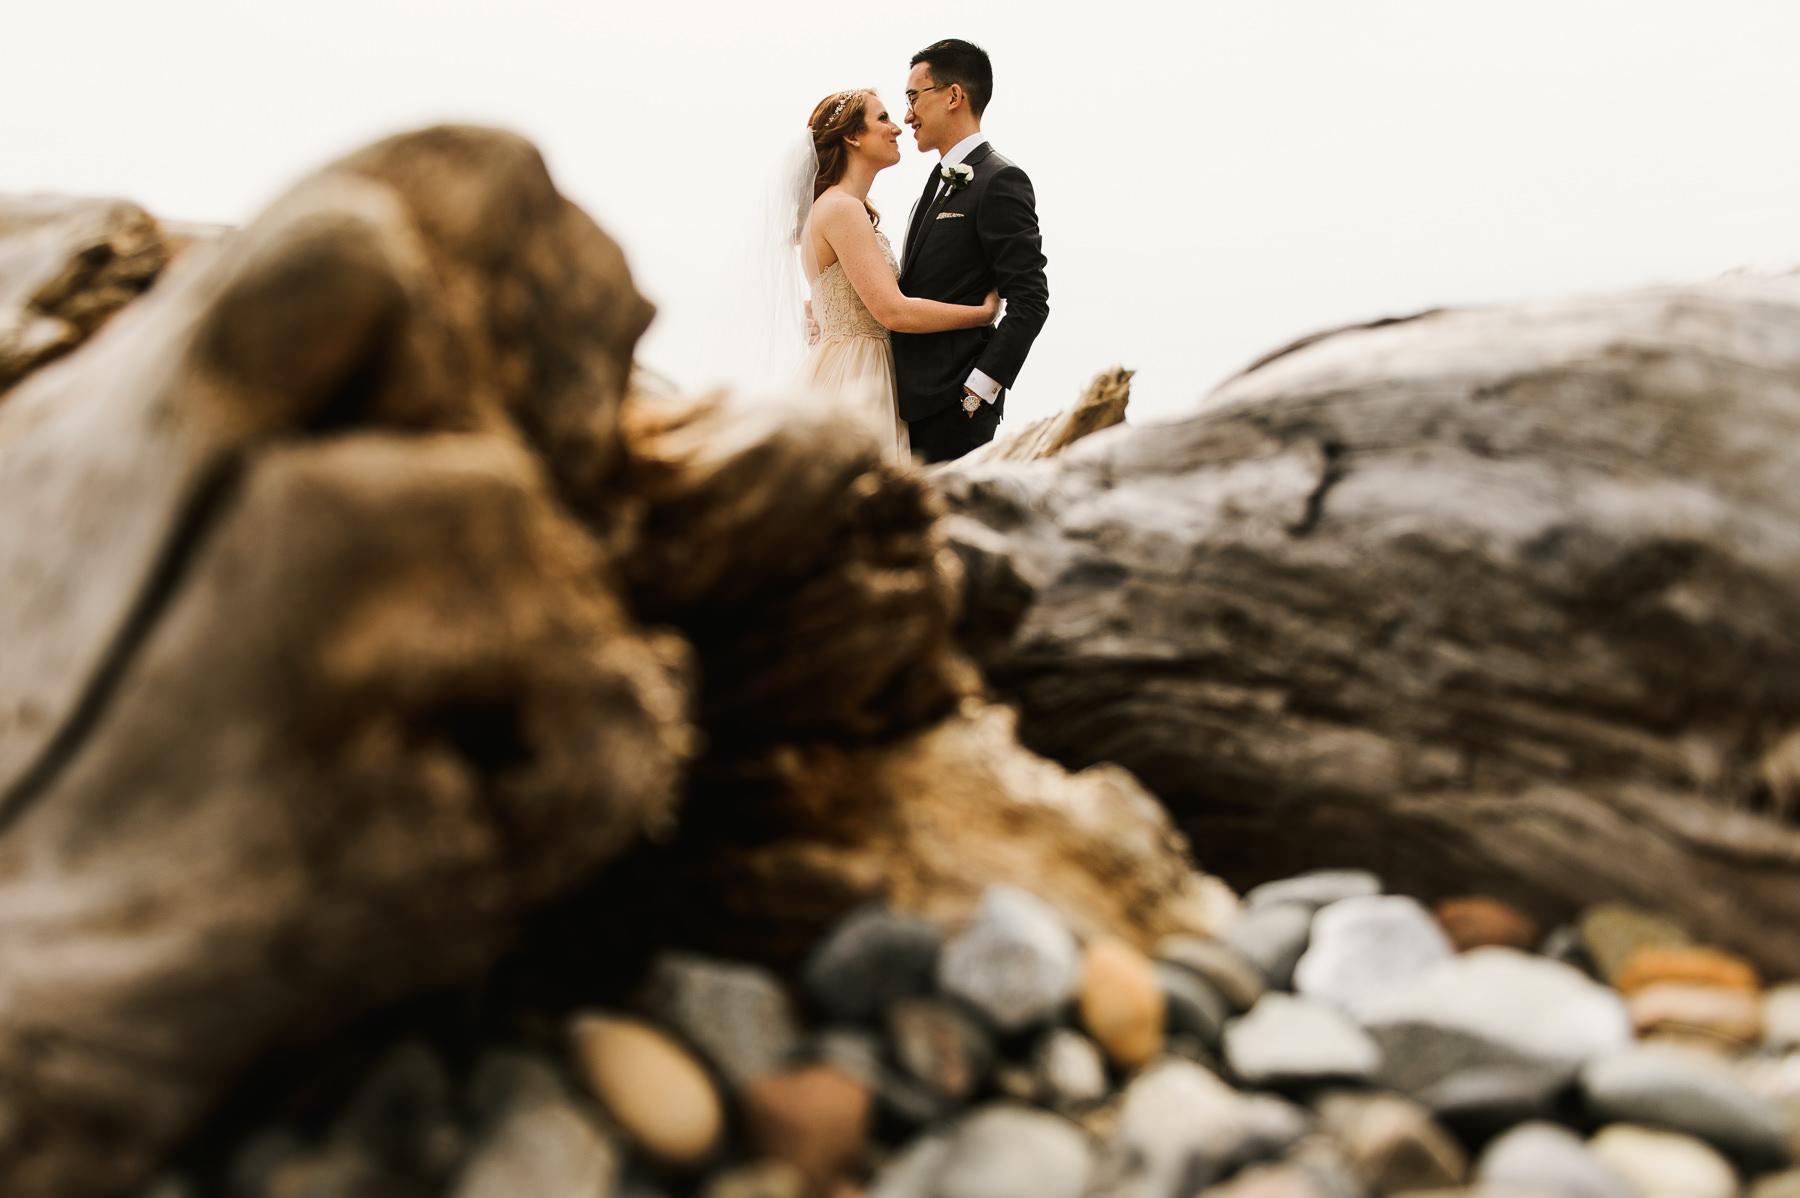 sculpture park drift wood wedding portrait